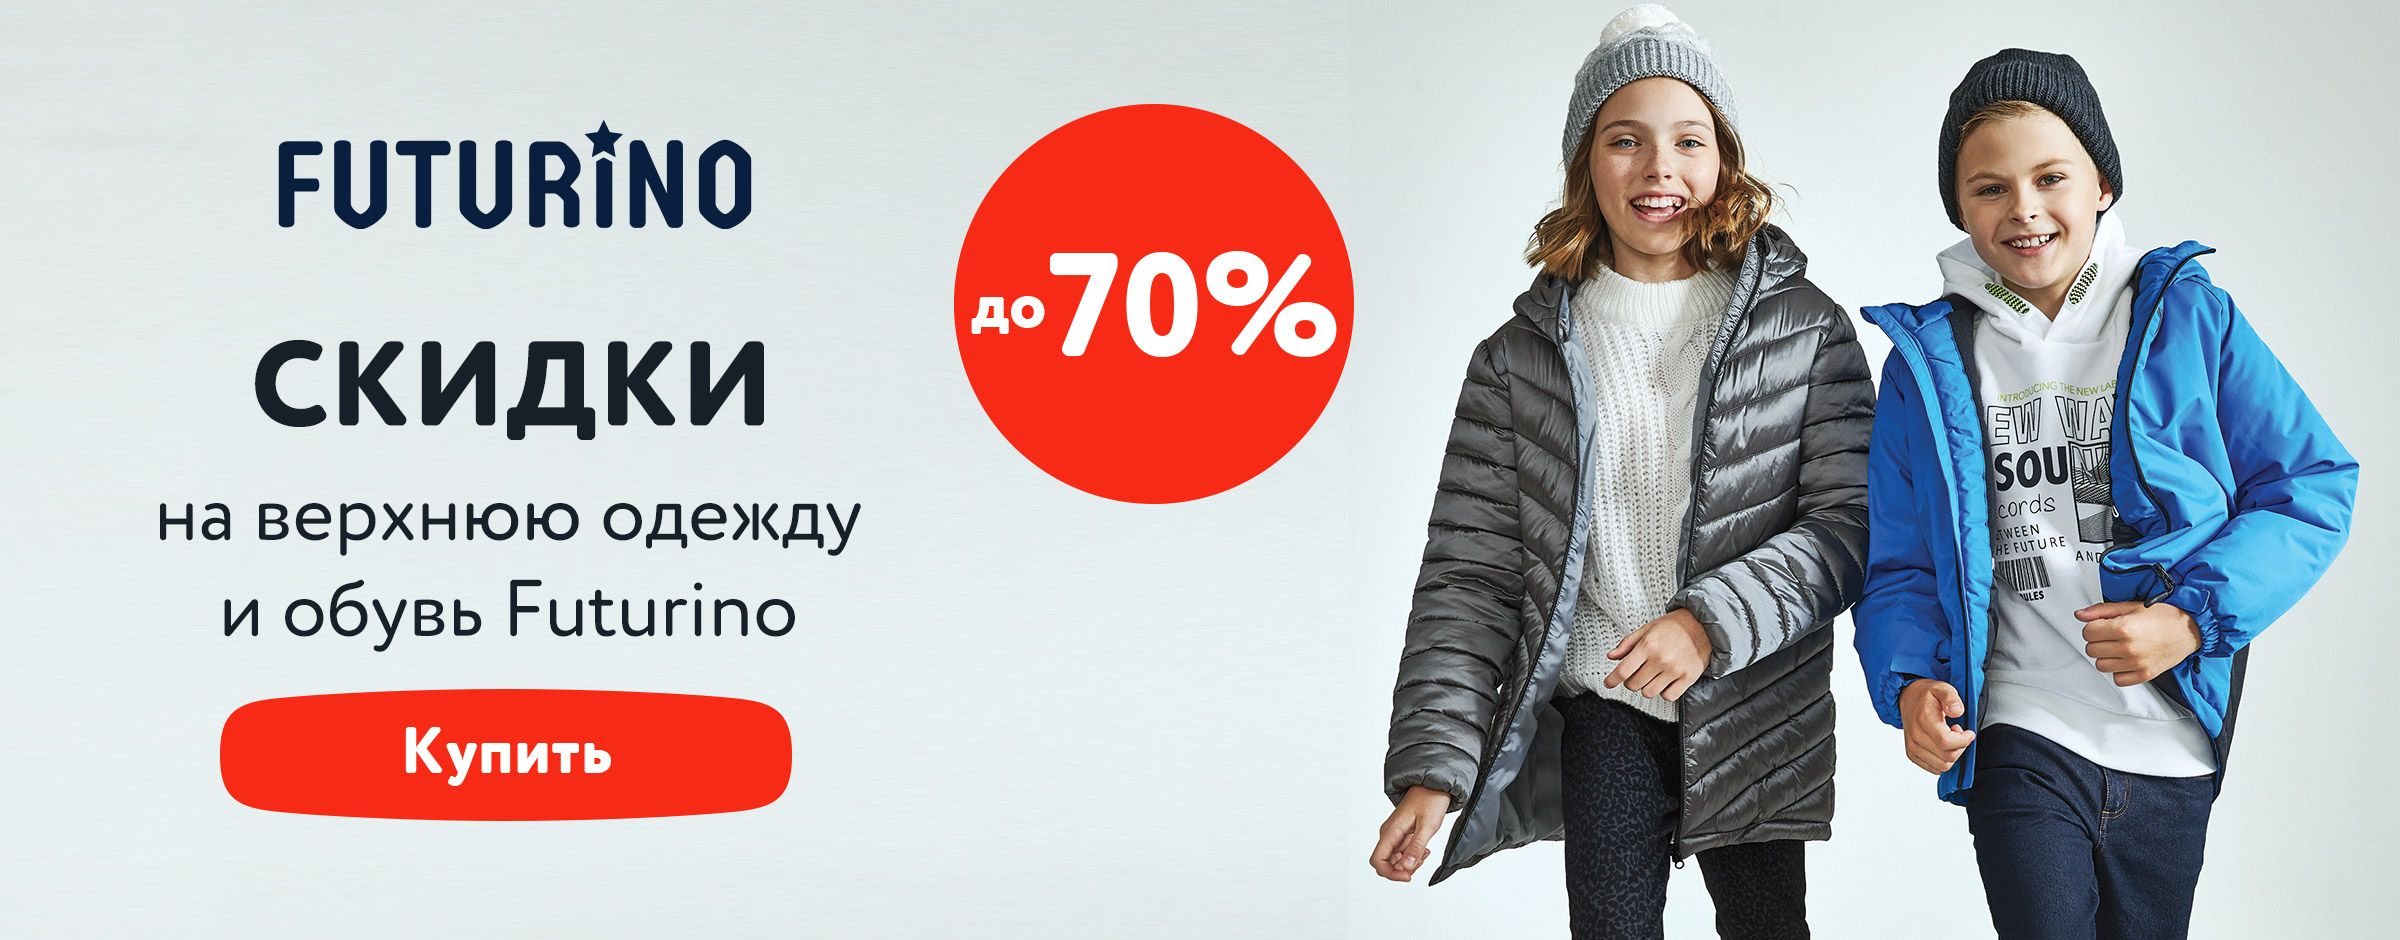 До 70% на верхнюю одежду Futurino статика